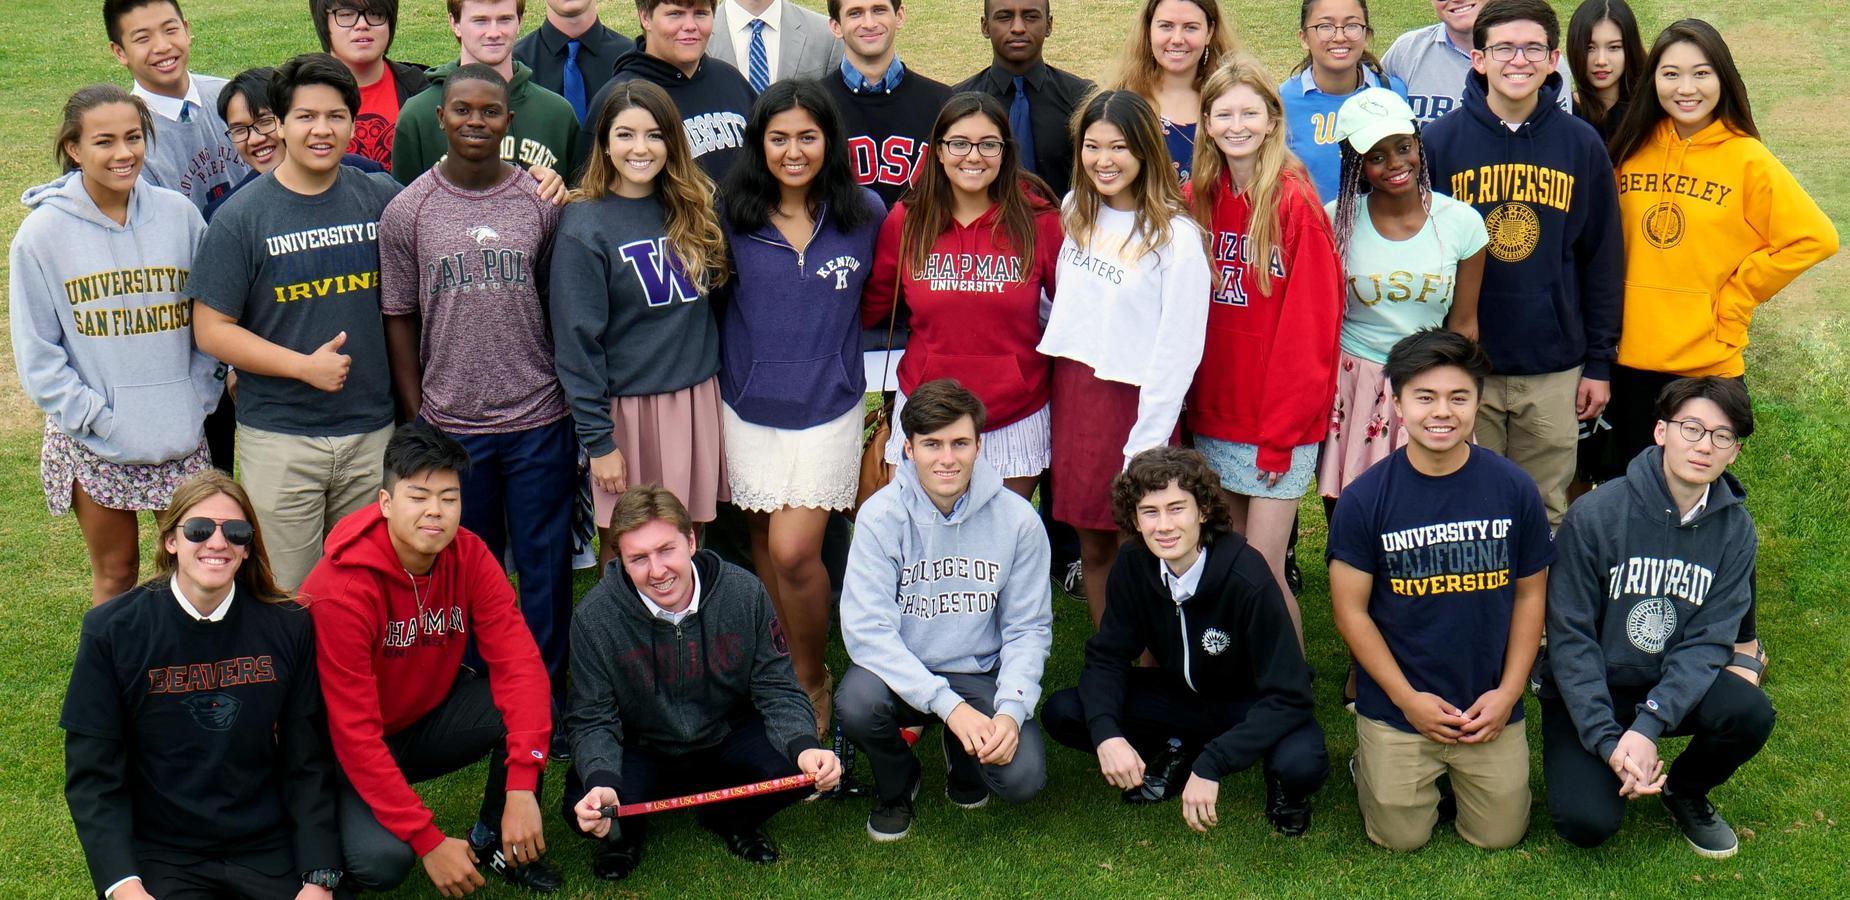 Senior College Photo from 2018